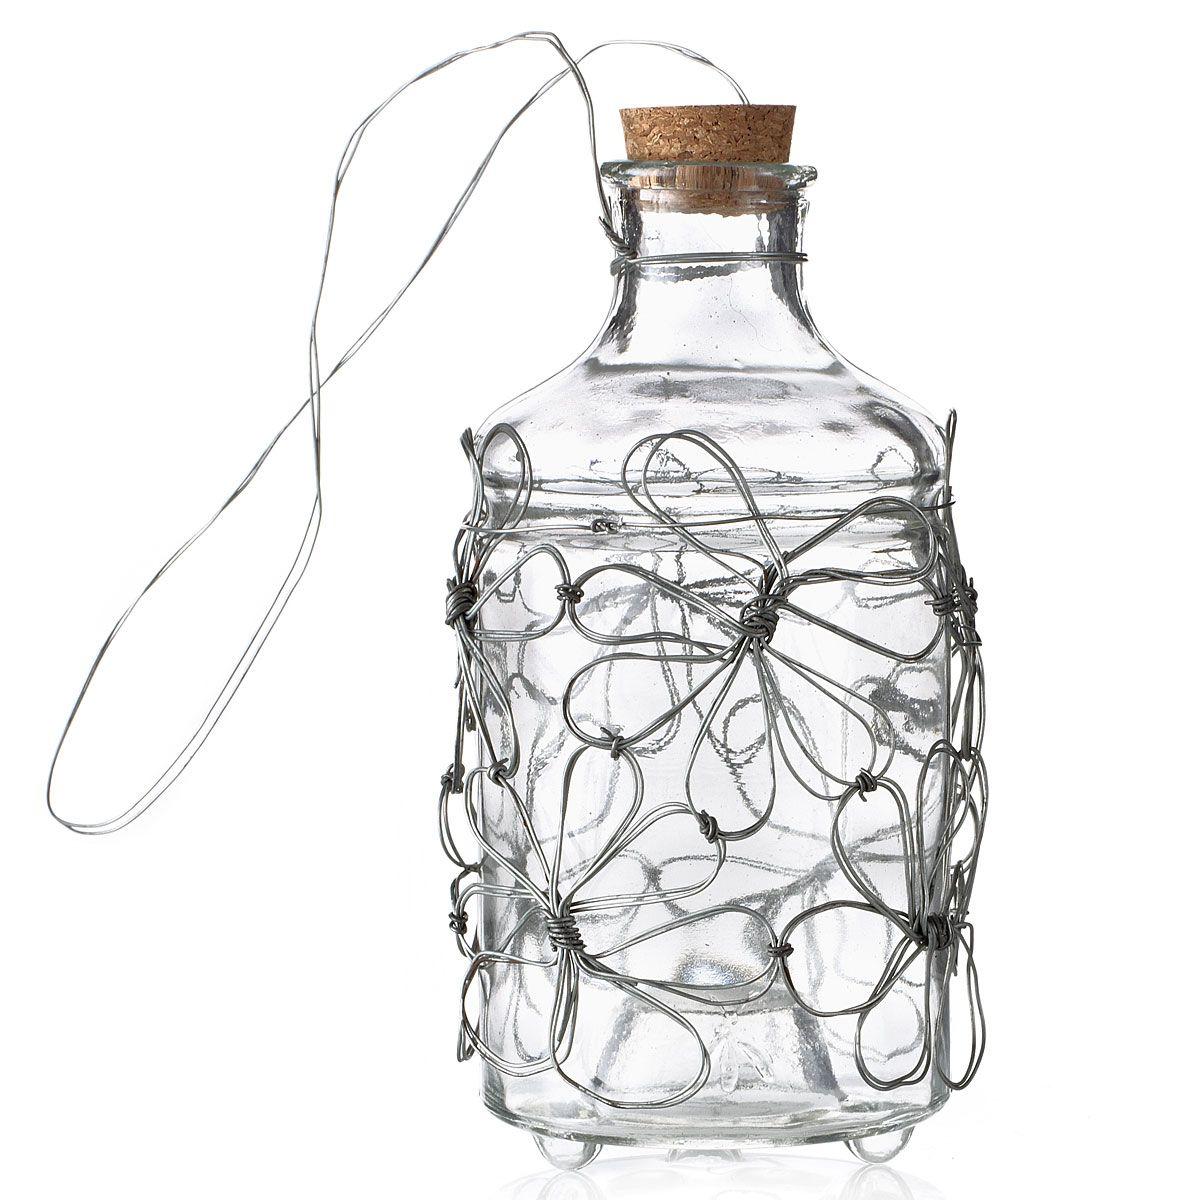 Wired Bottle